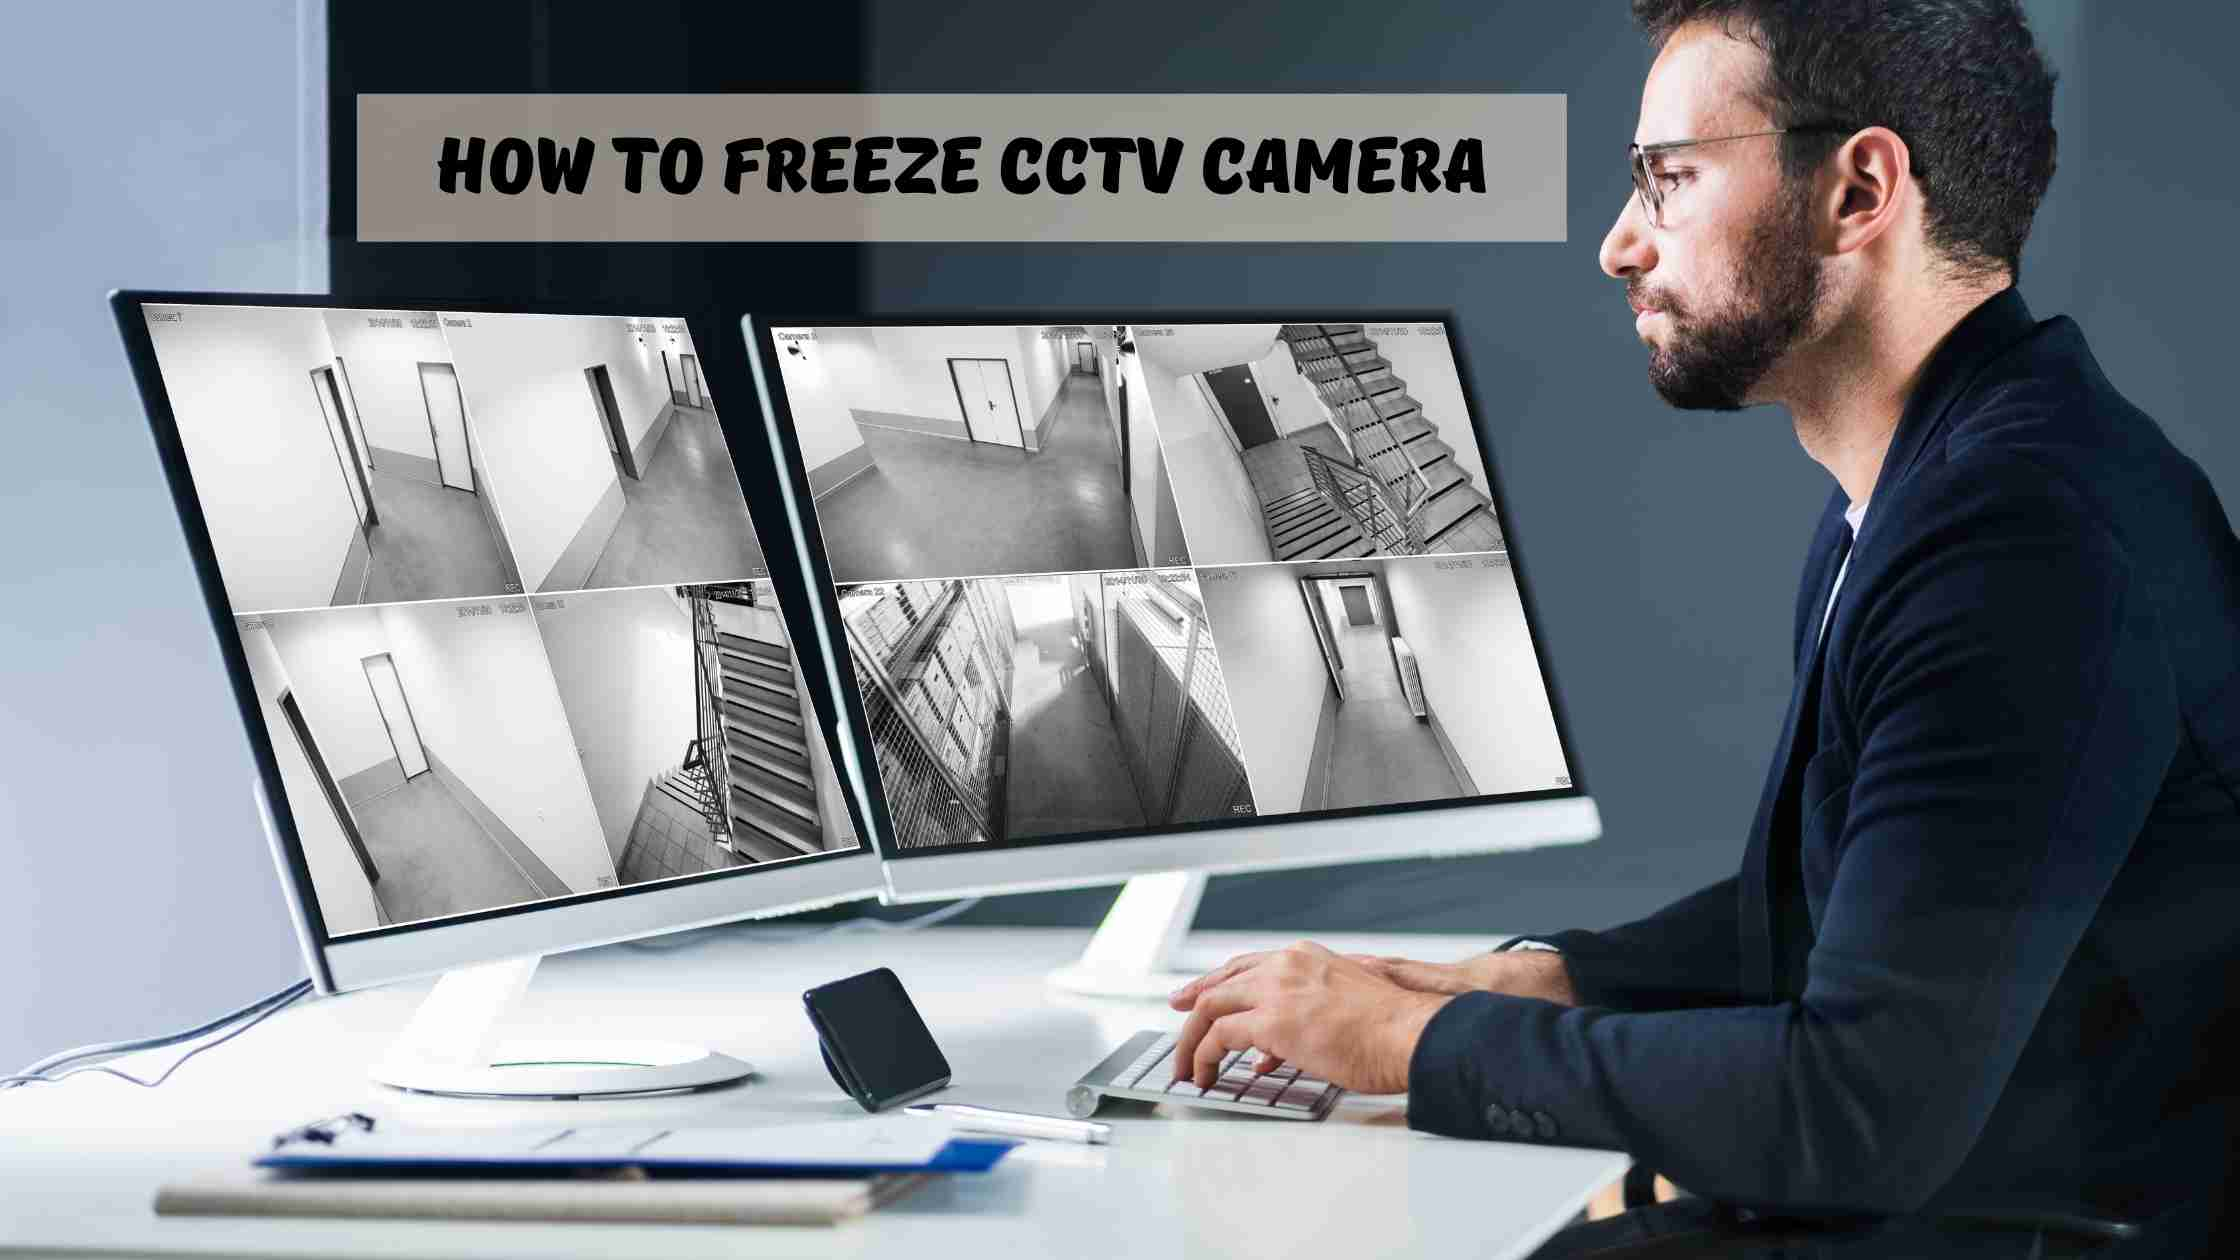 how to freeze CCTV camera